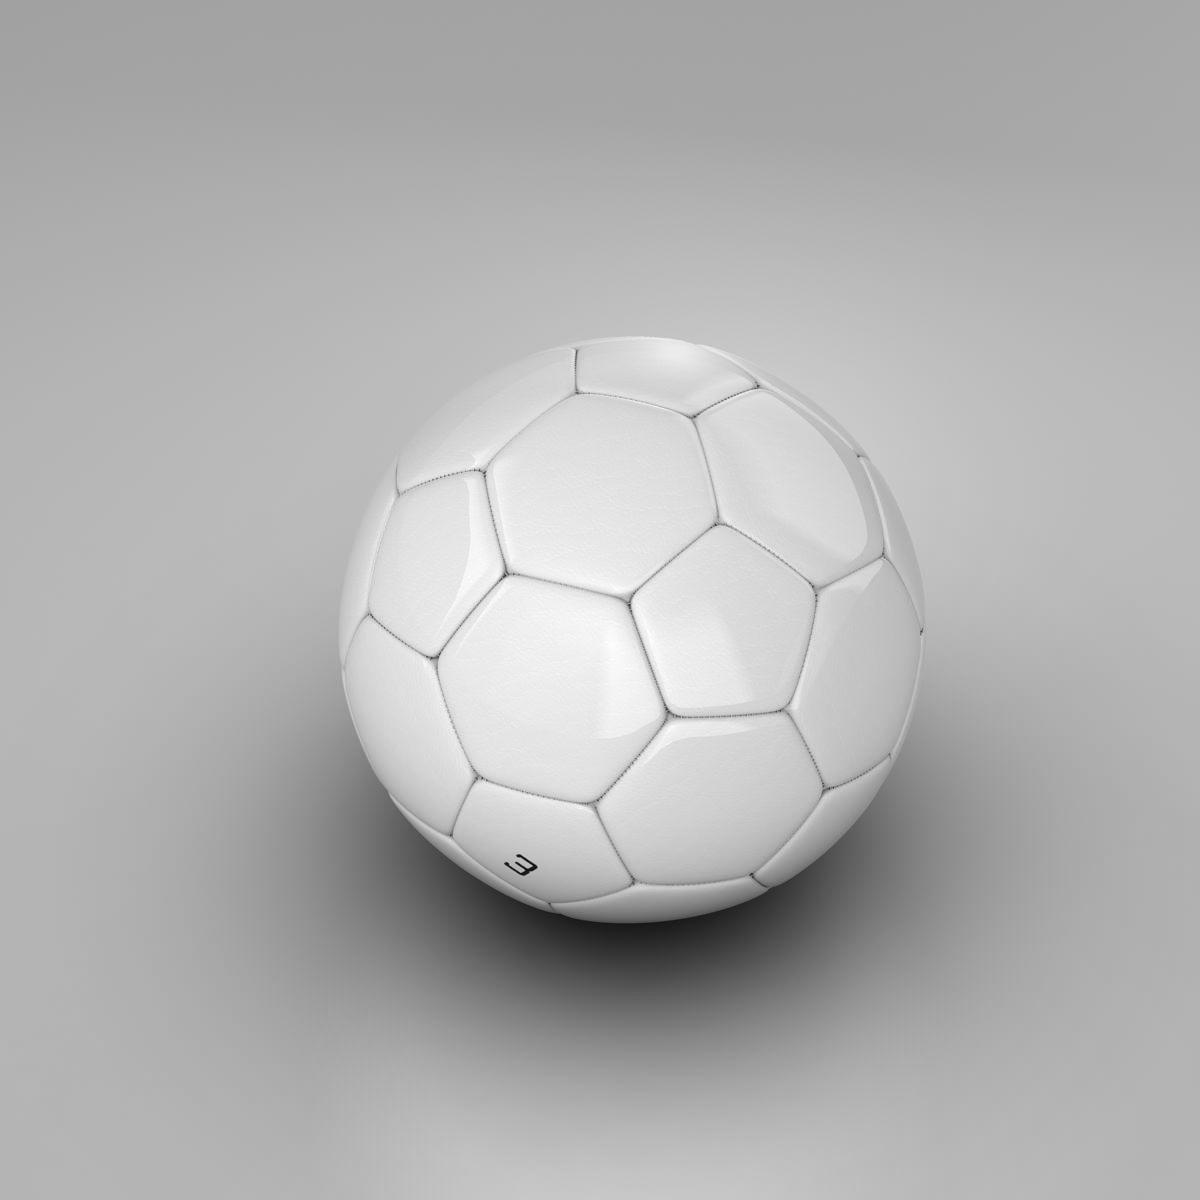 soccerball цагаан 3d загвар 3ds max fbx c4d ma mb obj 205179